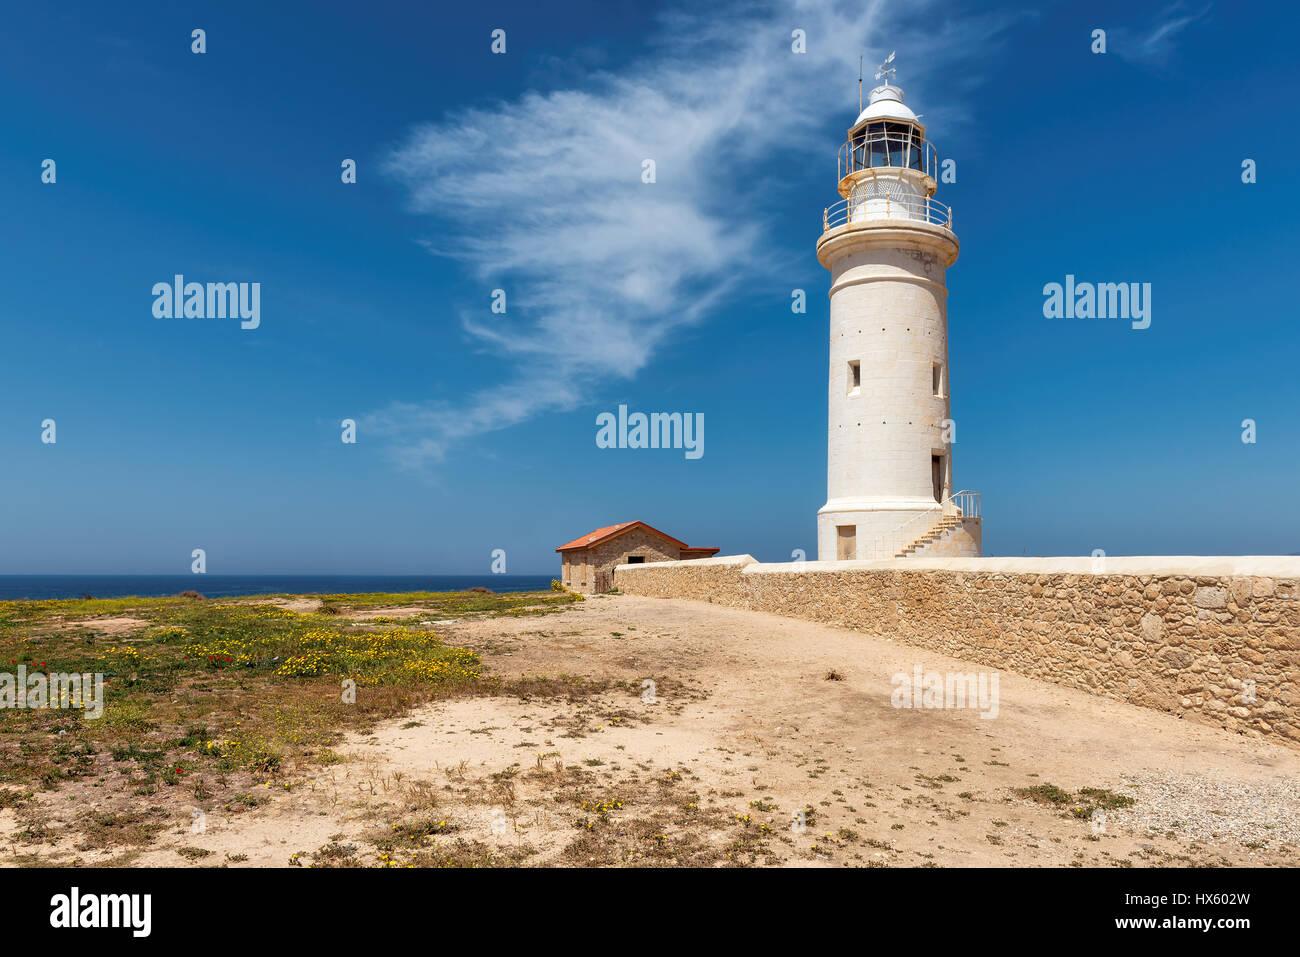 Cyprus Lighthouse, Paphos. - Stock Image